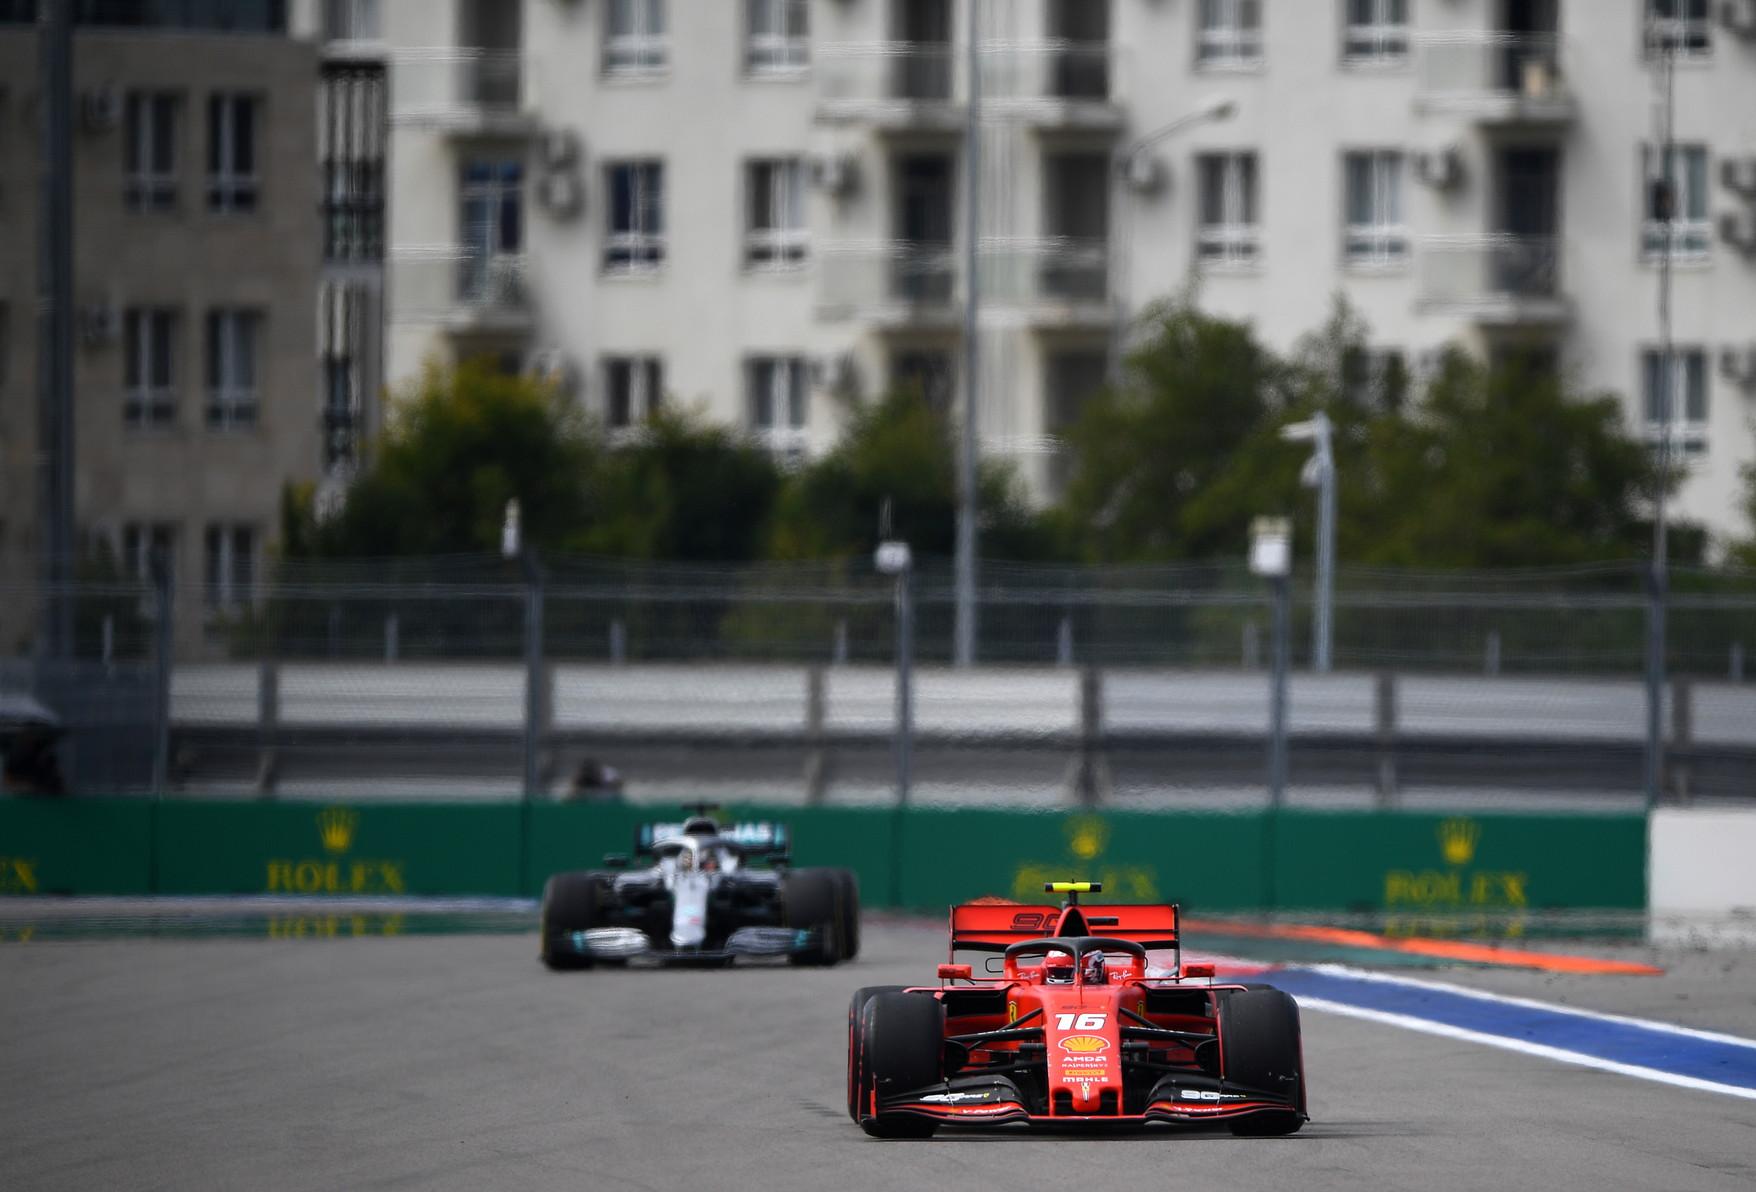 Venerdì di libere in Russia, a una settimana dalla doppietta Ferrari di Singapore